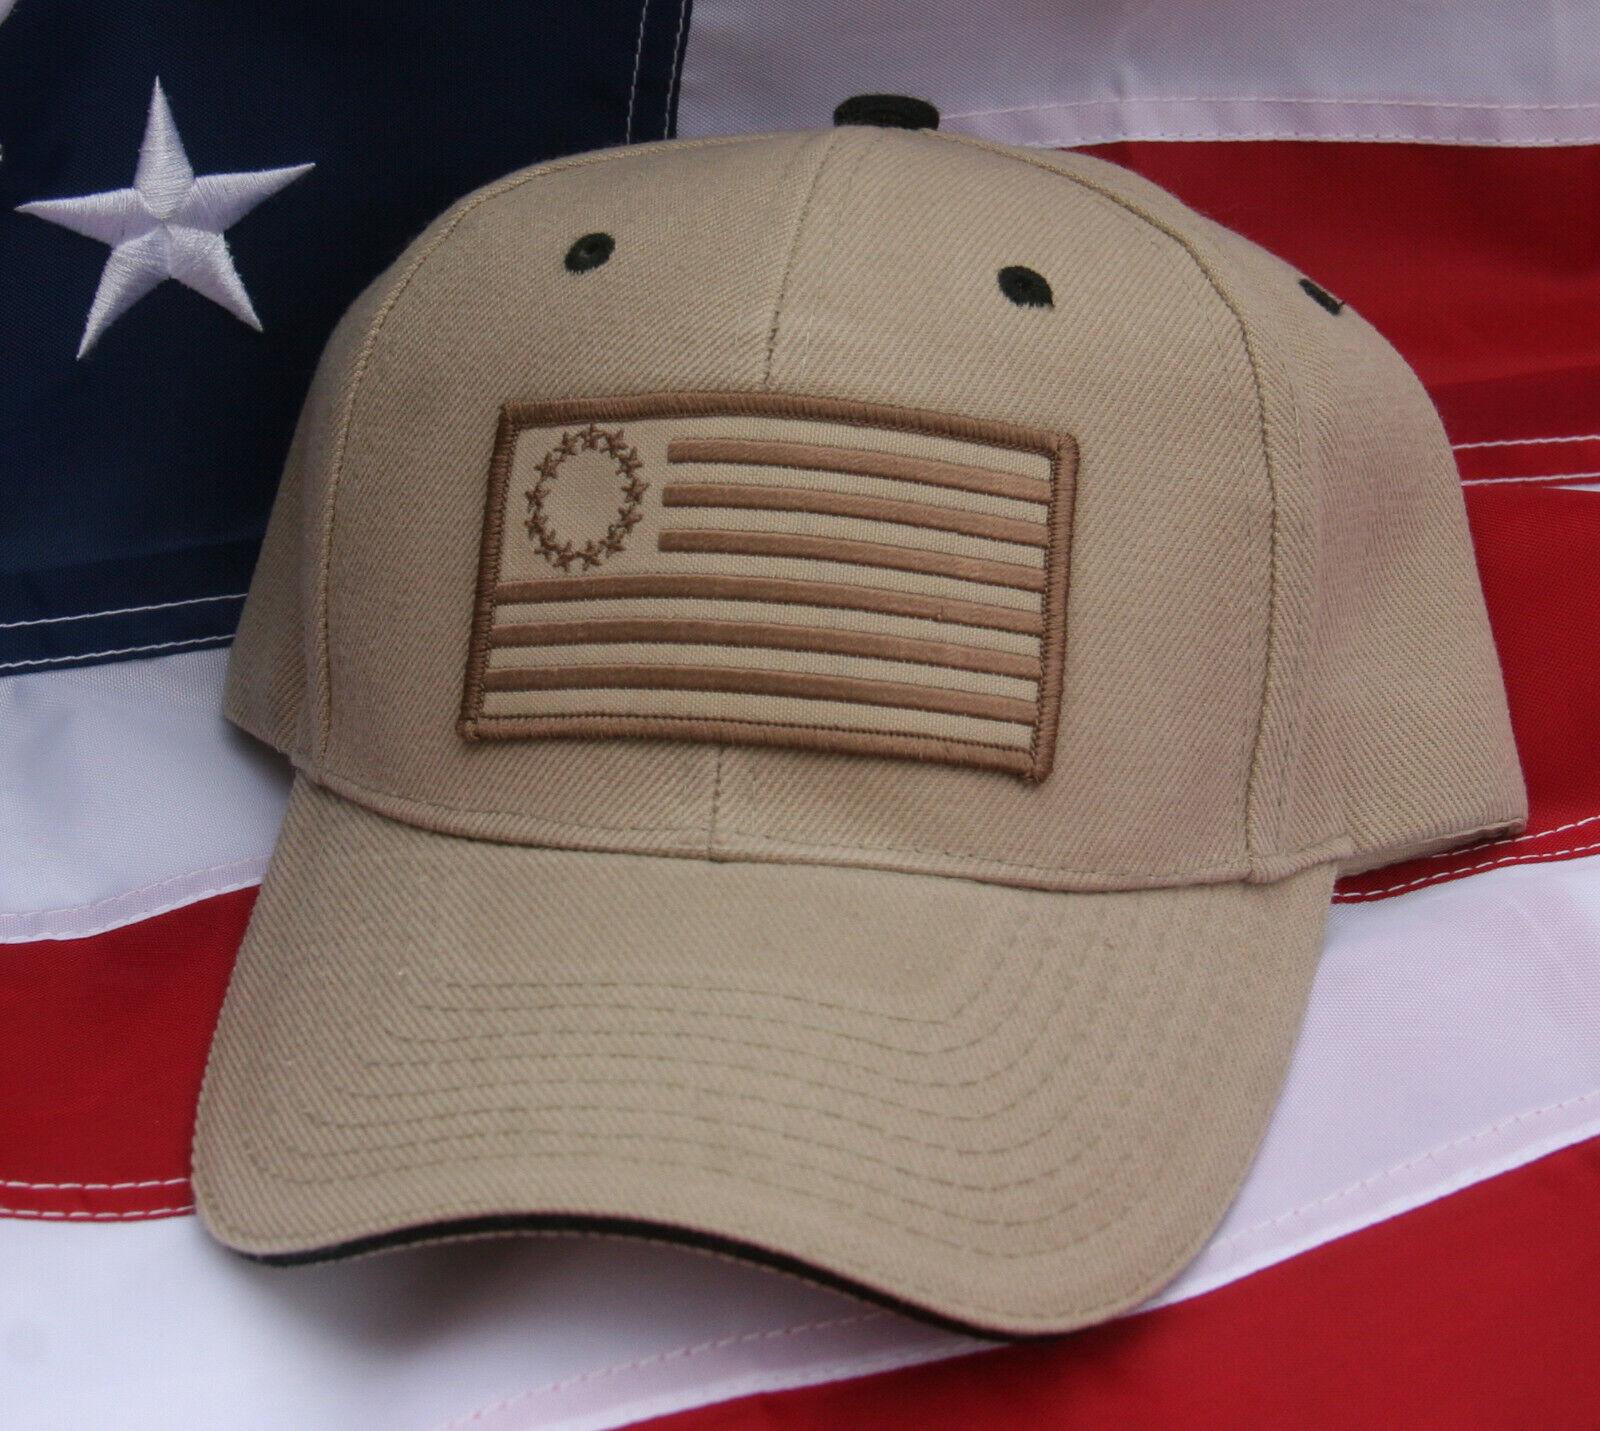 FLAG PATCH 13 STARS PIN UP NIKE USA CAP